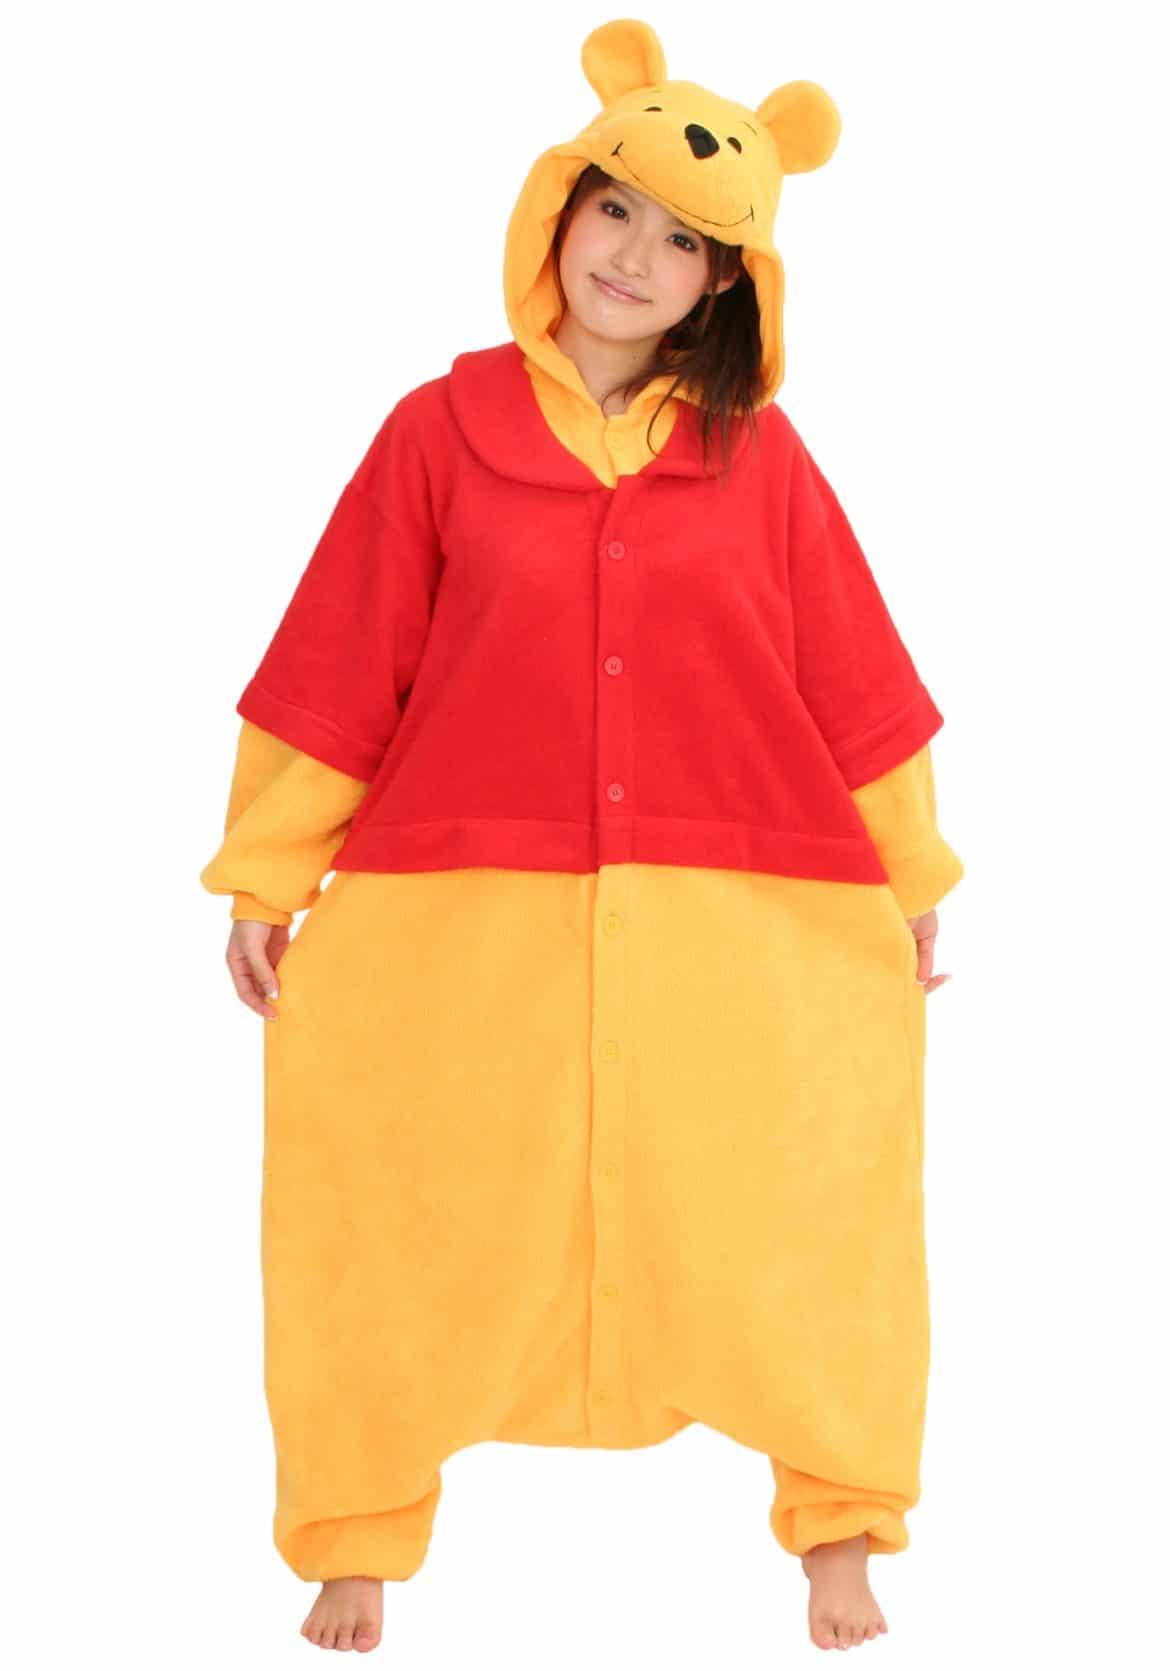 Pooh-Pajama-Costume-zoom